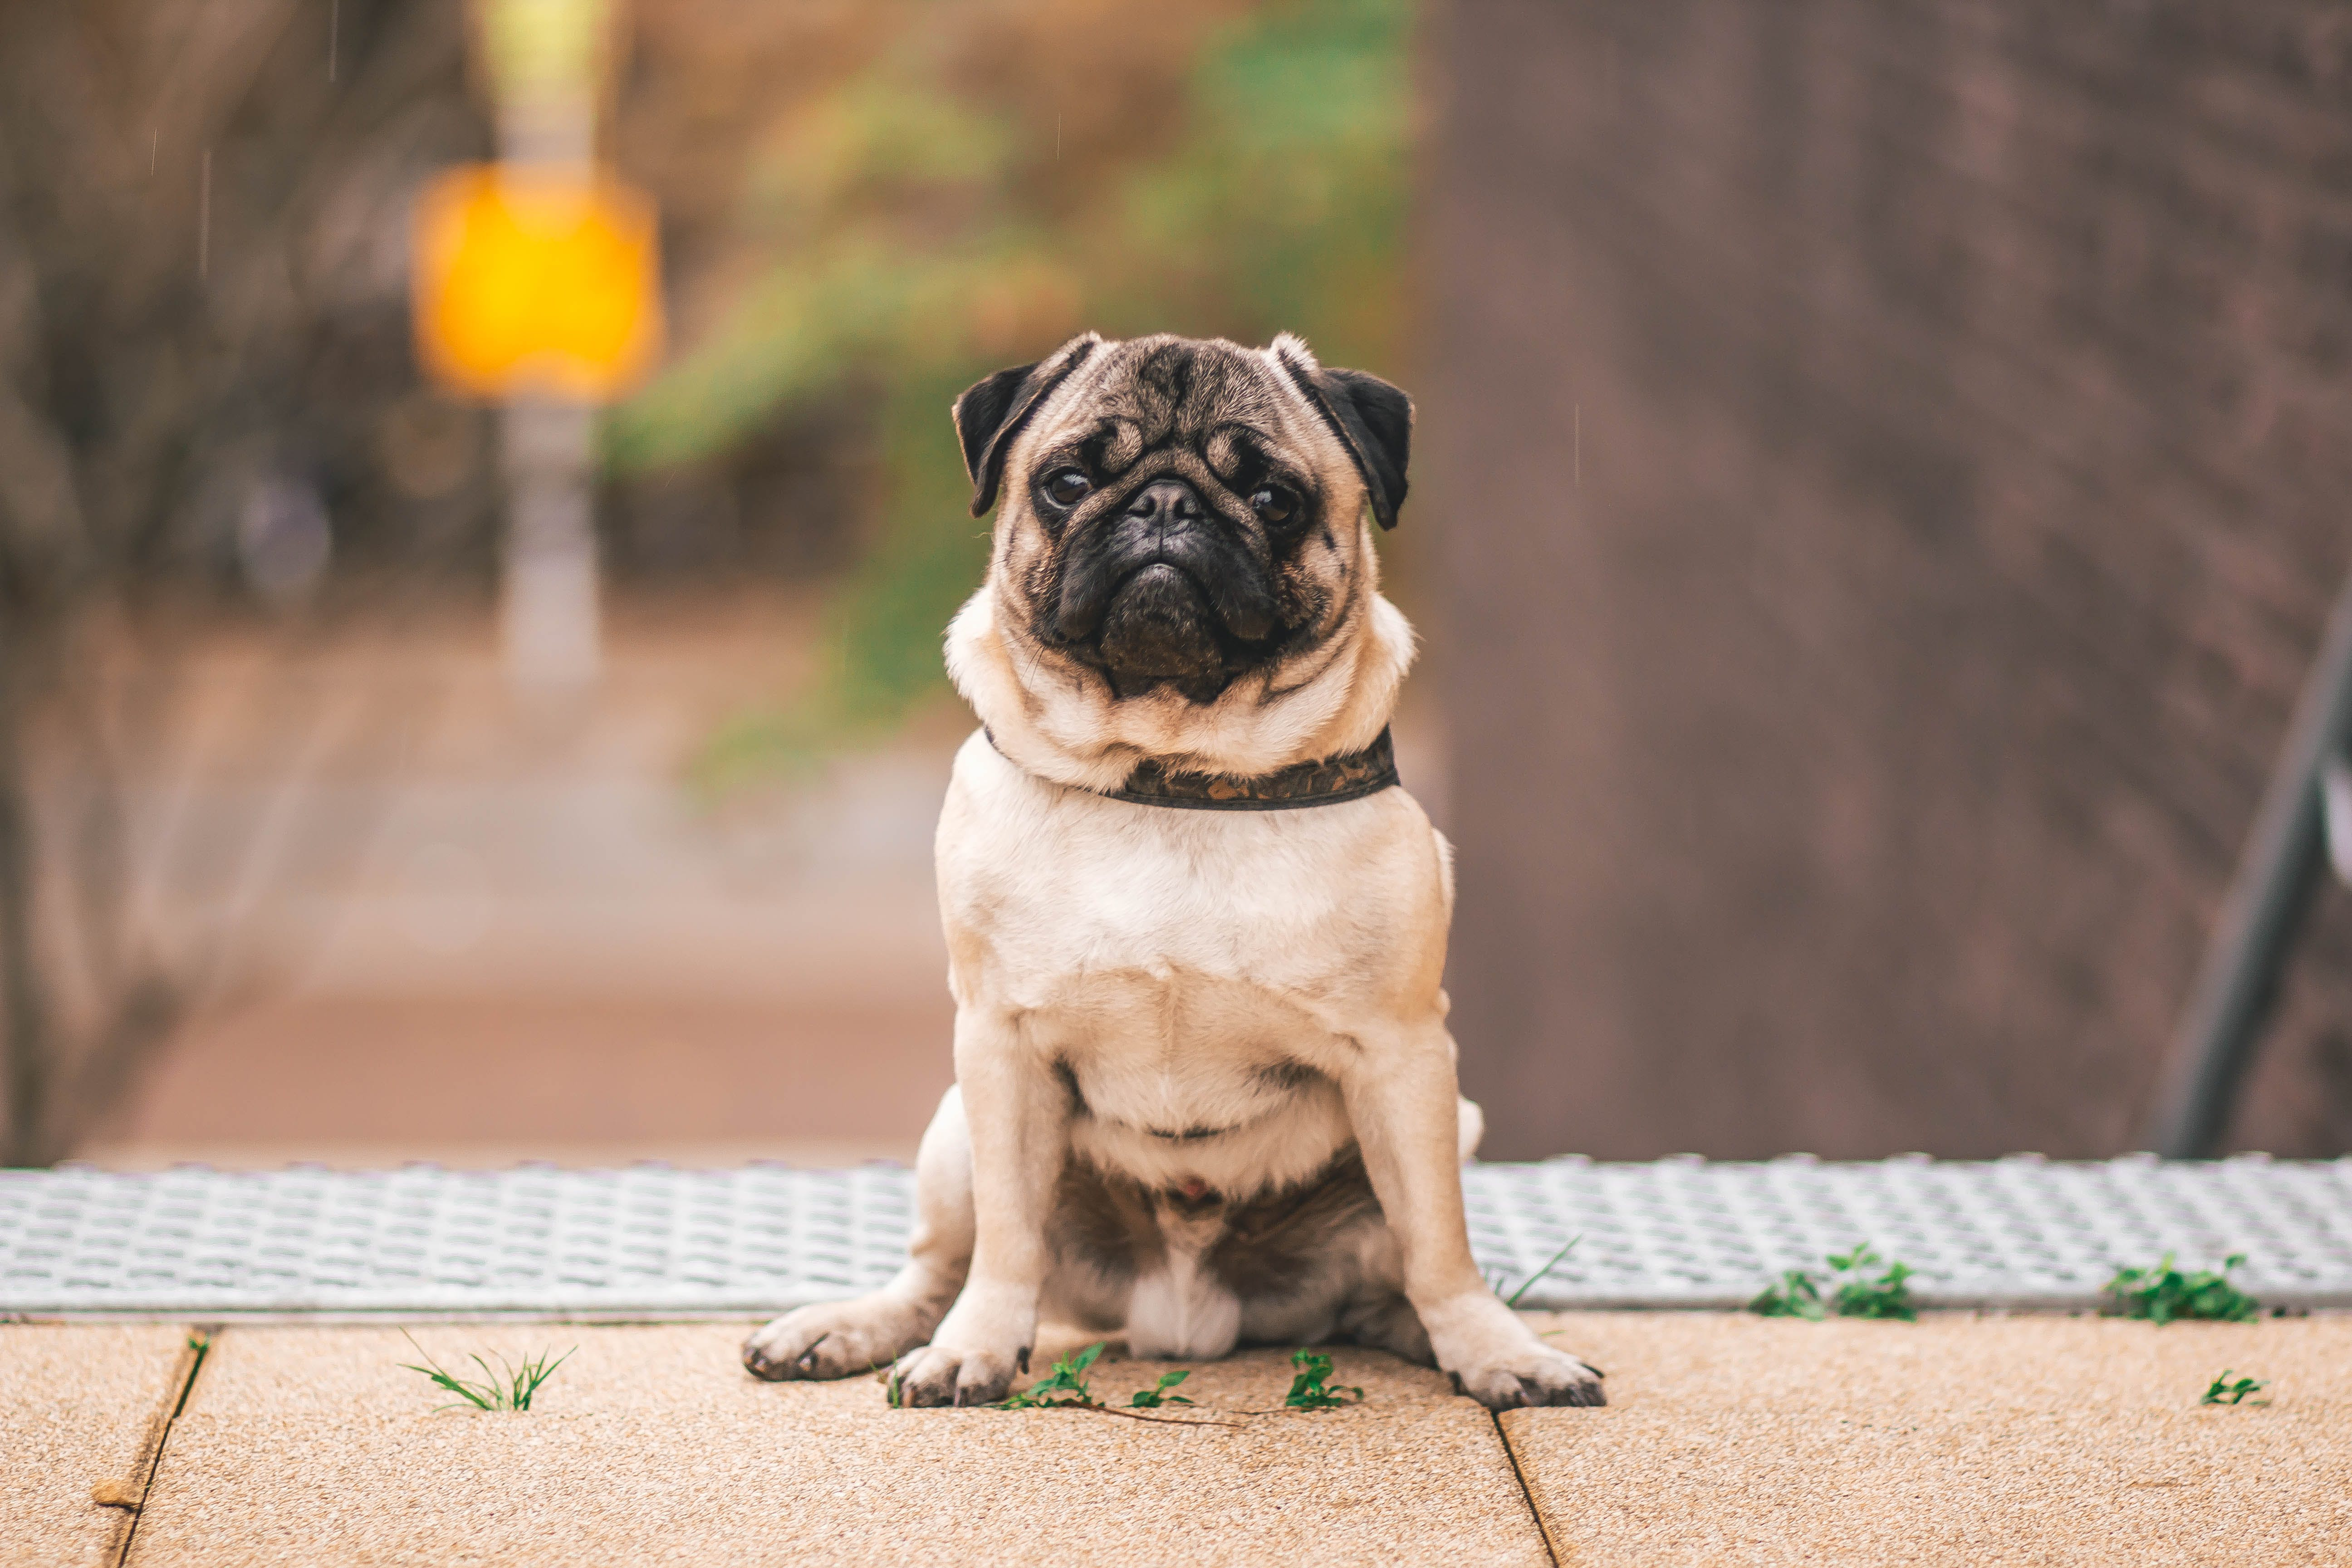 Pawn Pug Sitting on Beige Floor